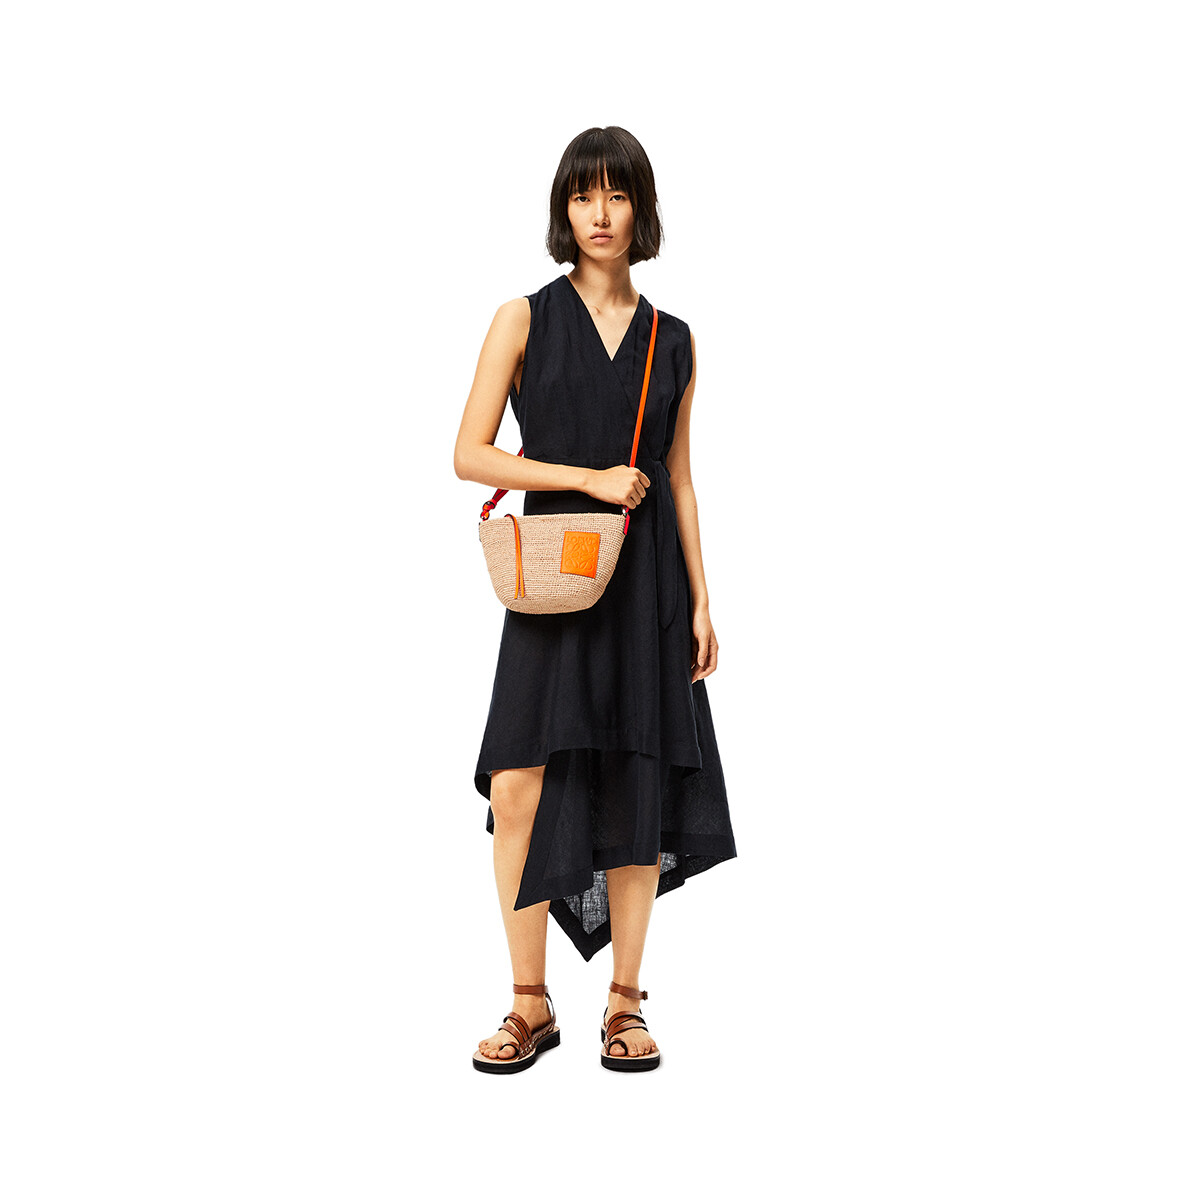 LOEWE Pochette Bag In Raffia And Calfskin Natural/Neon Orange front